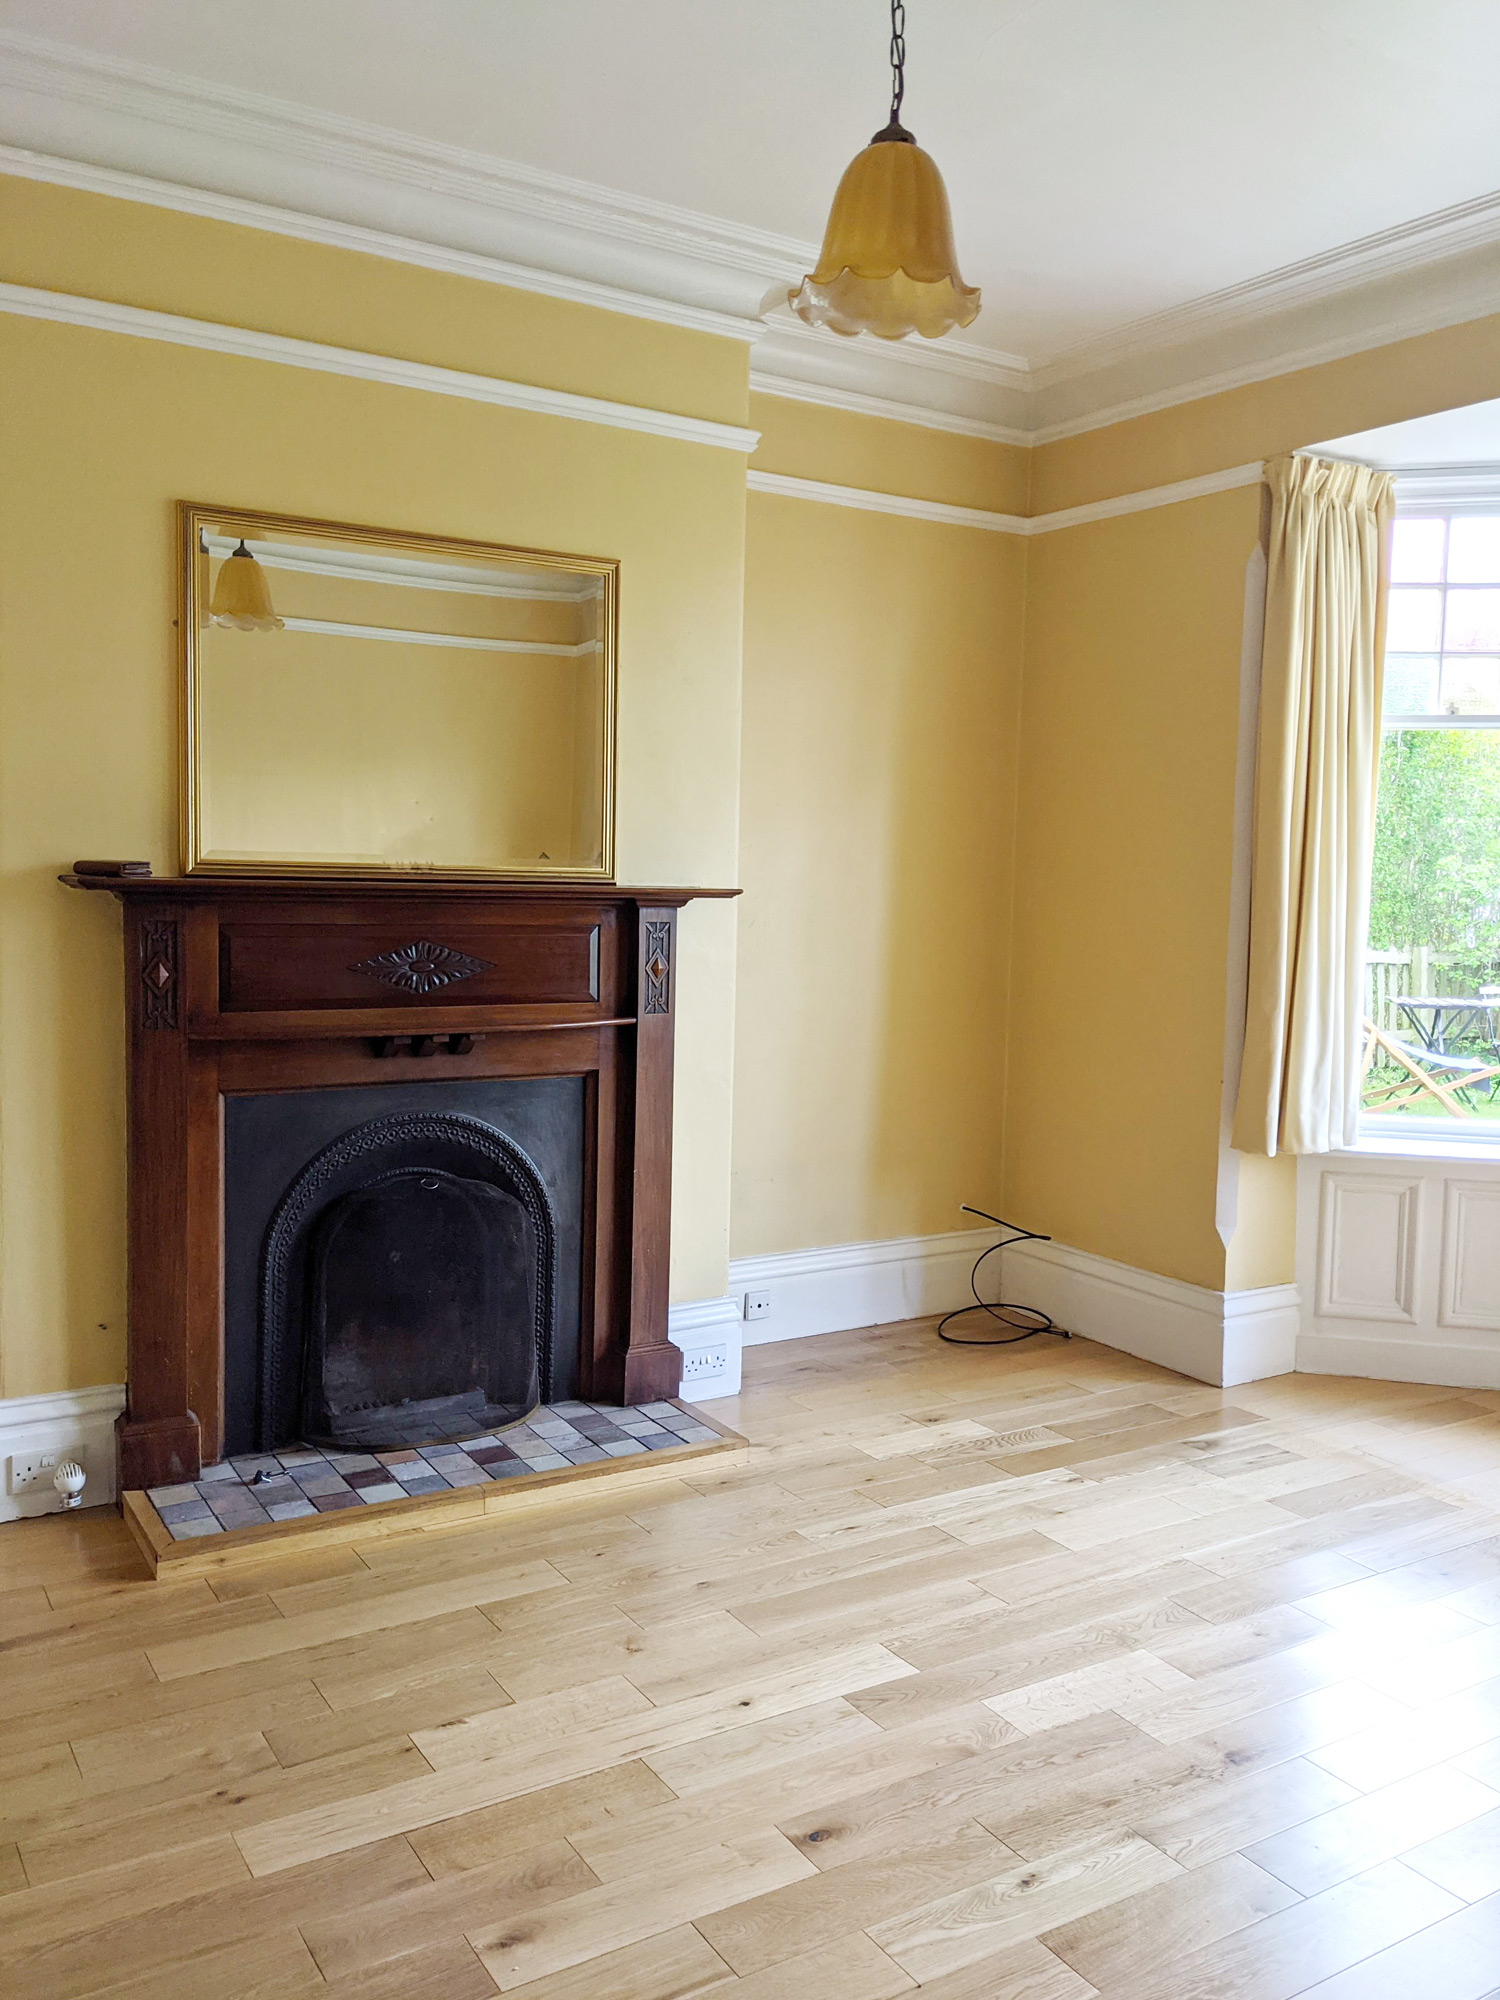 thelovecatsinc-installing-log-buring-stove-fire-4